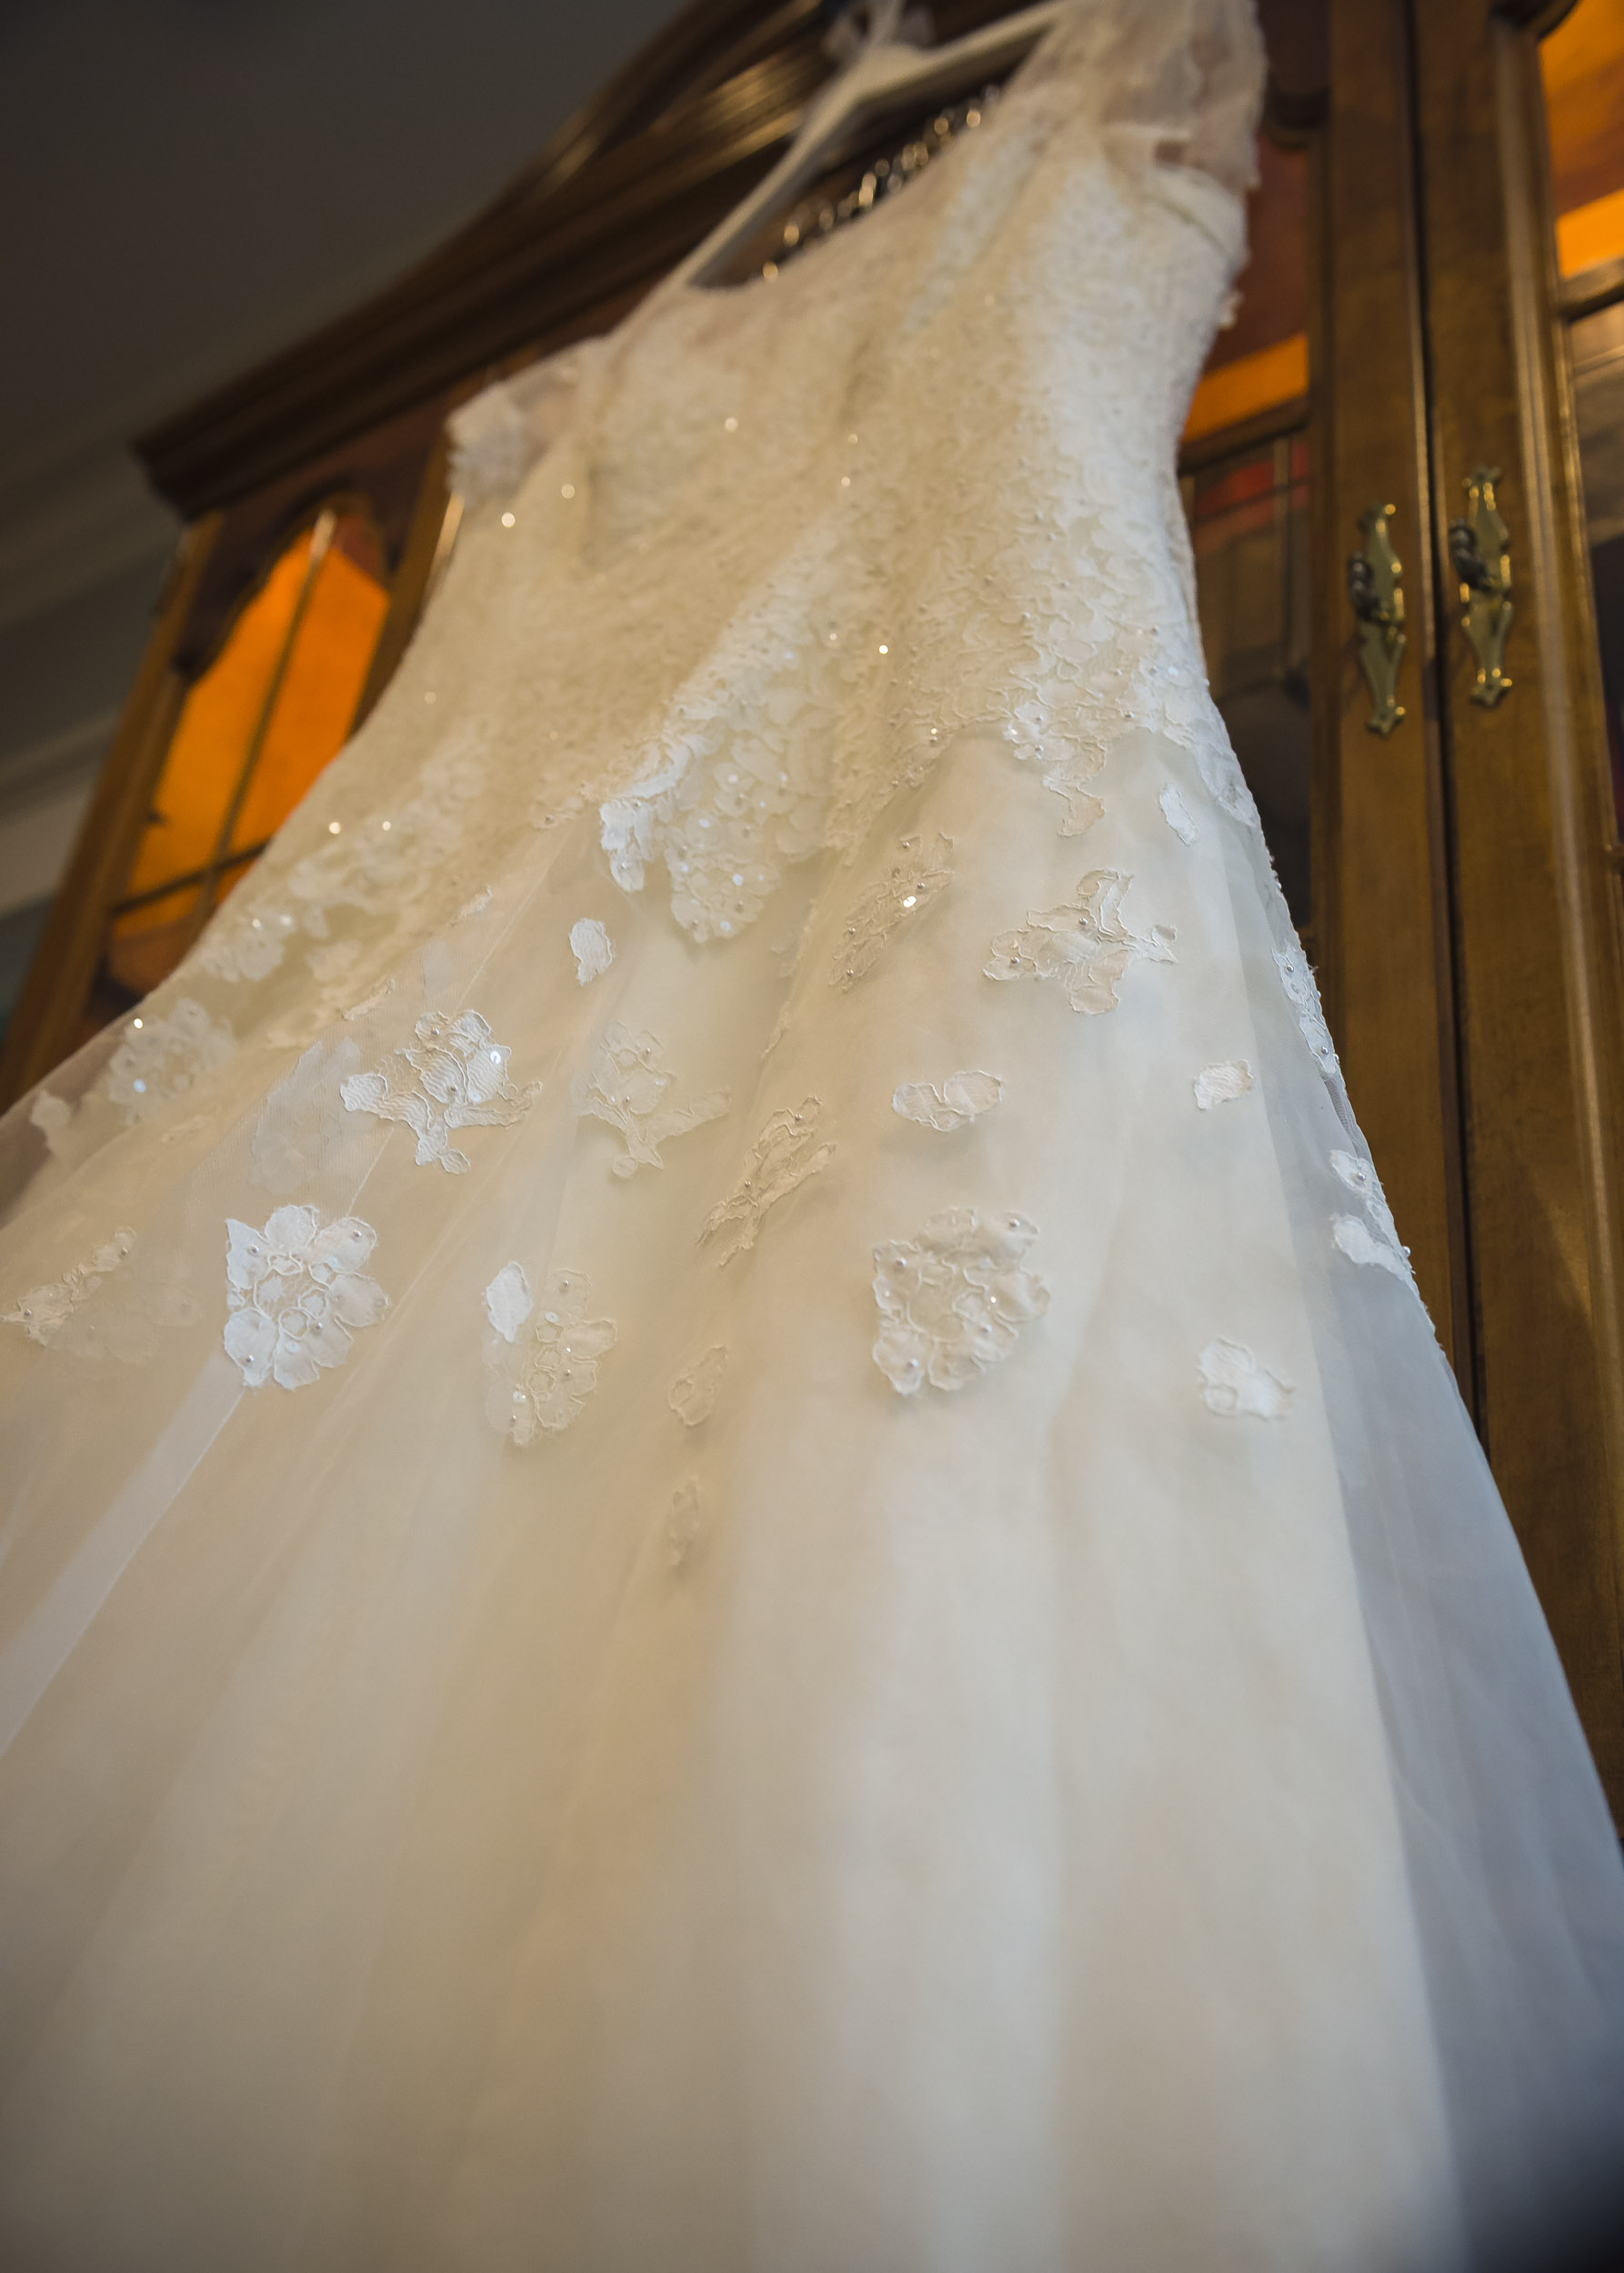 Images by Jeffrey House Photography (www.JeffreyHousePhotography.com)